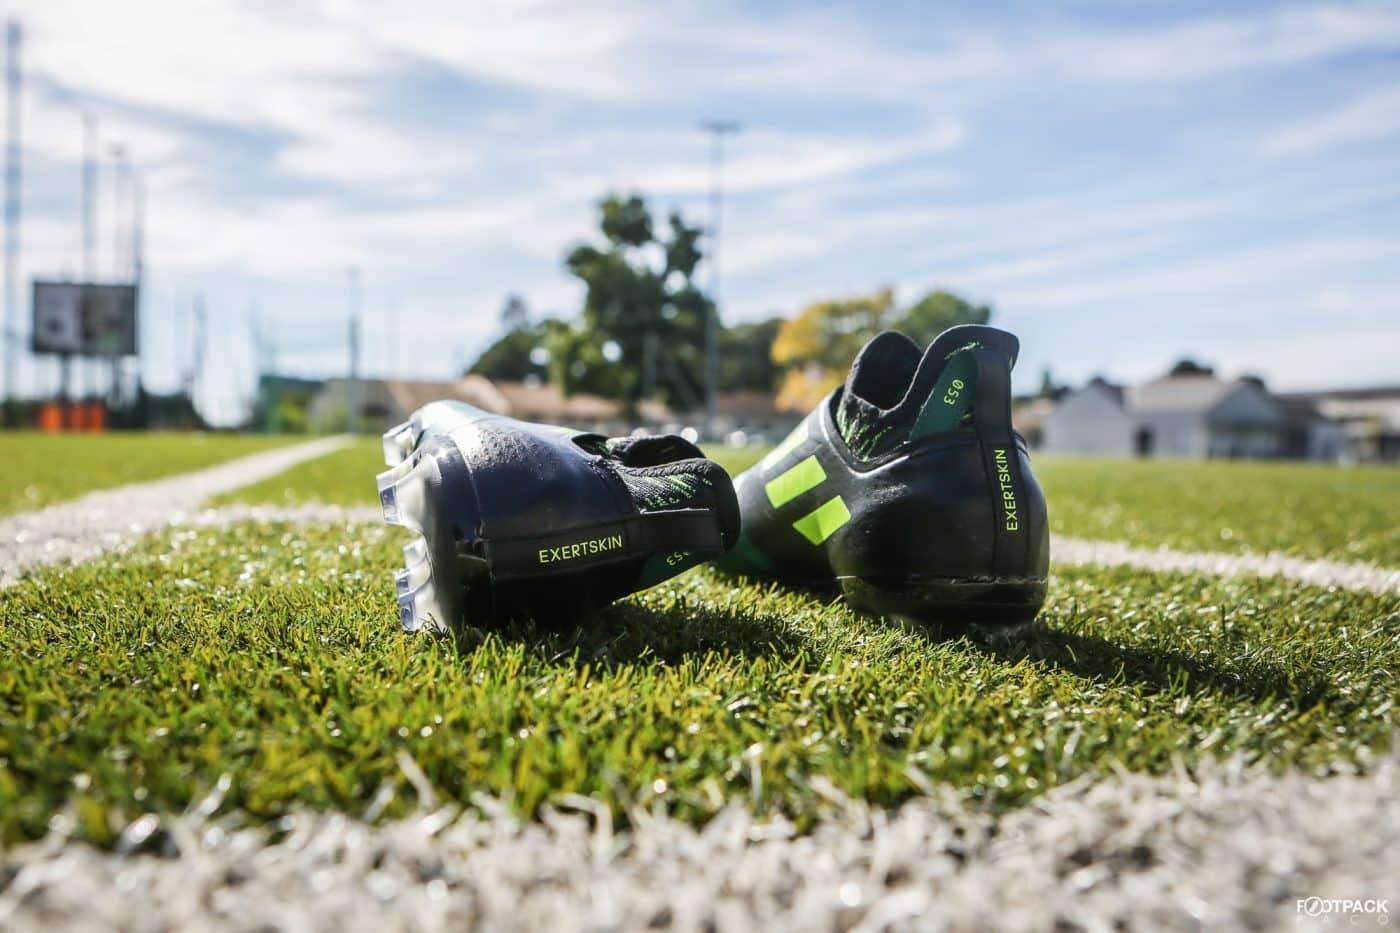 adidas-glitch-skin-exert-3